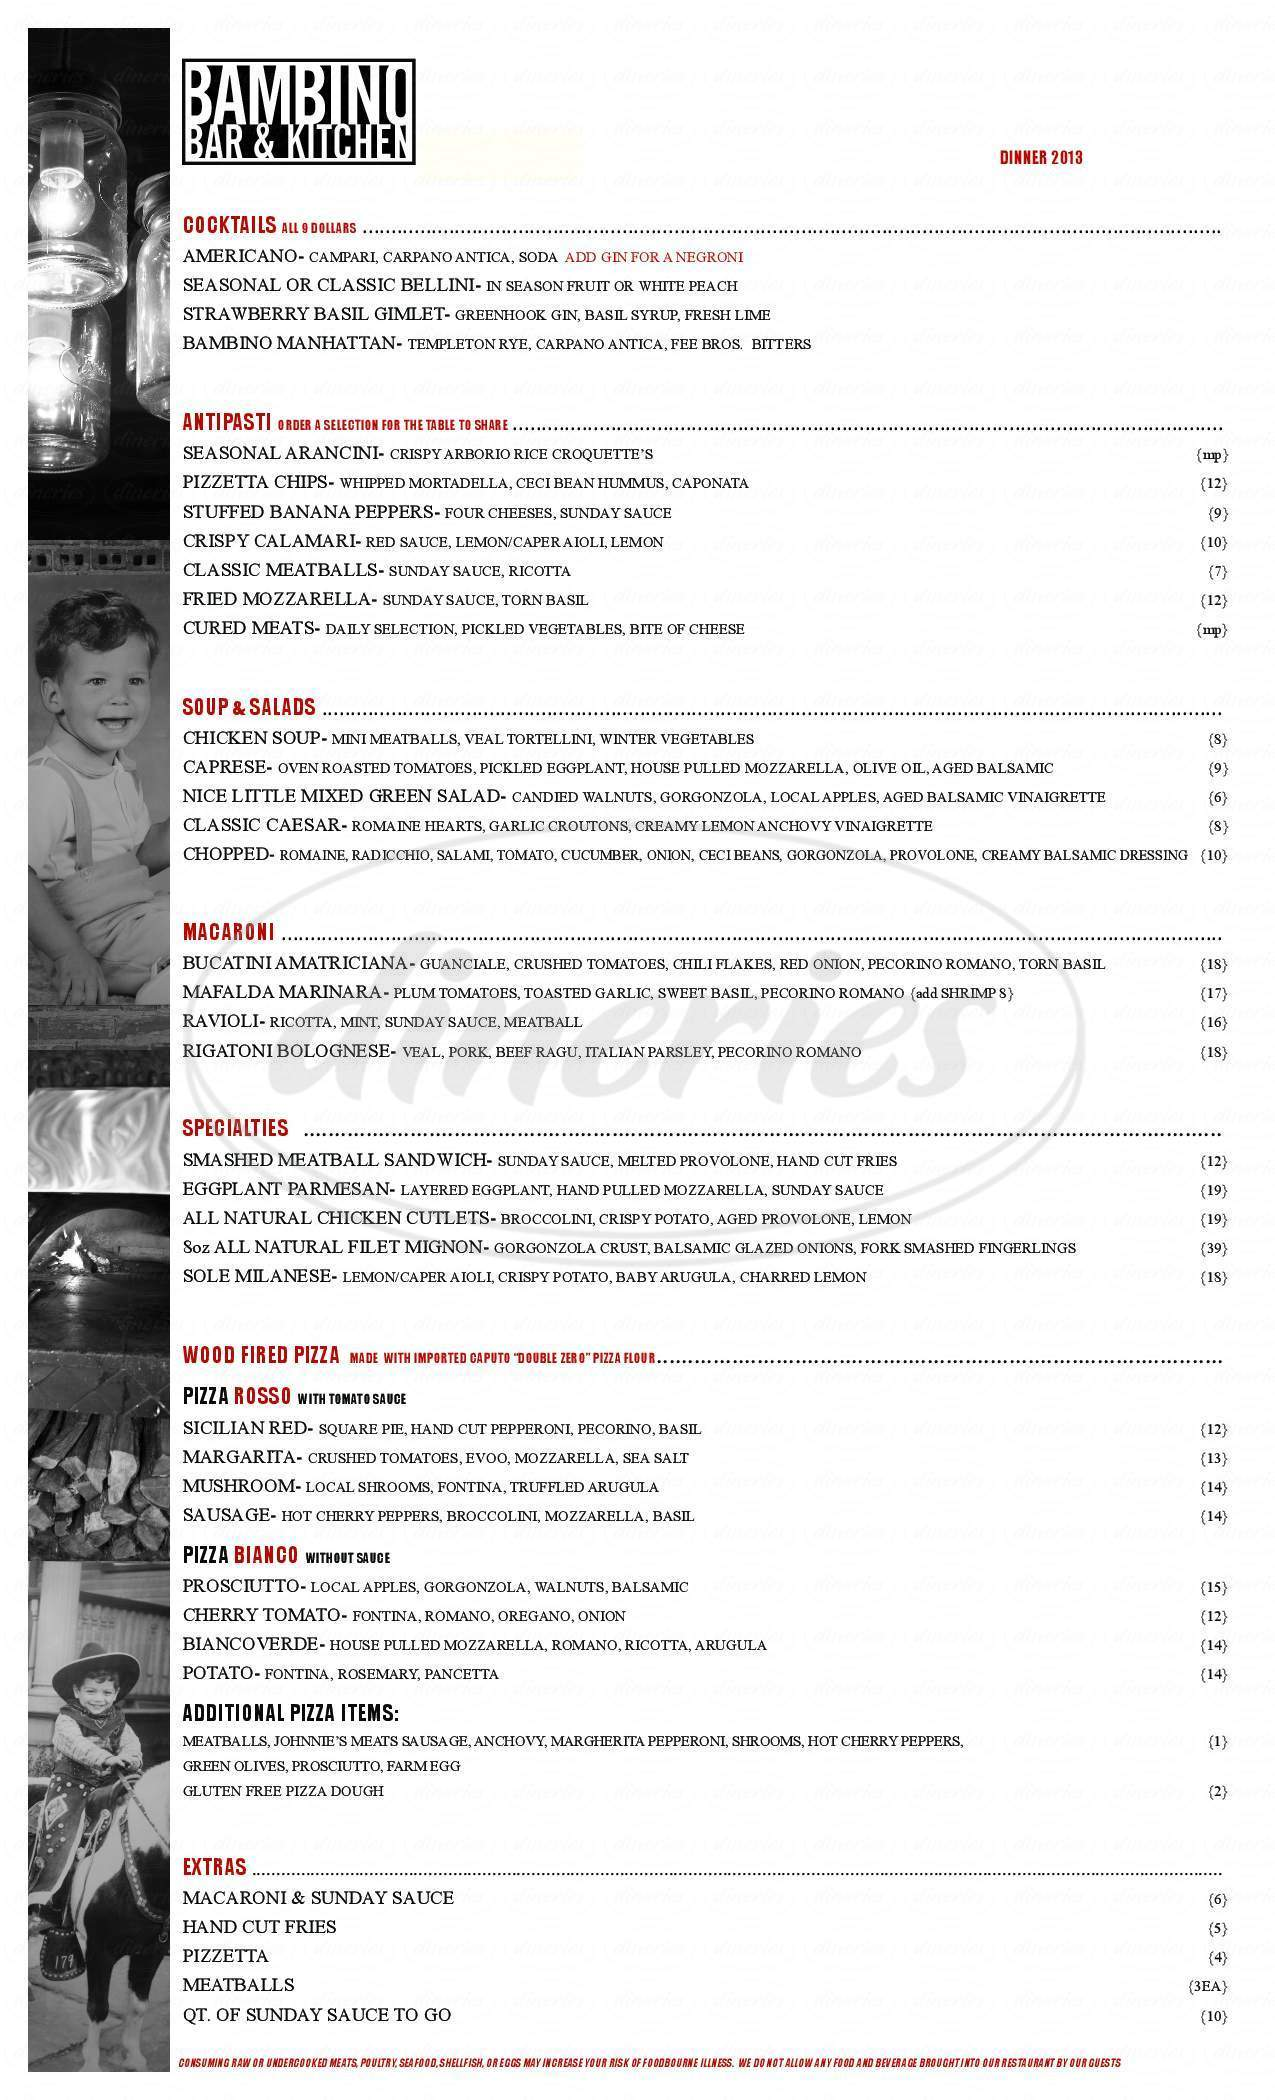 menu for Bambino Bar & Kitchen